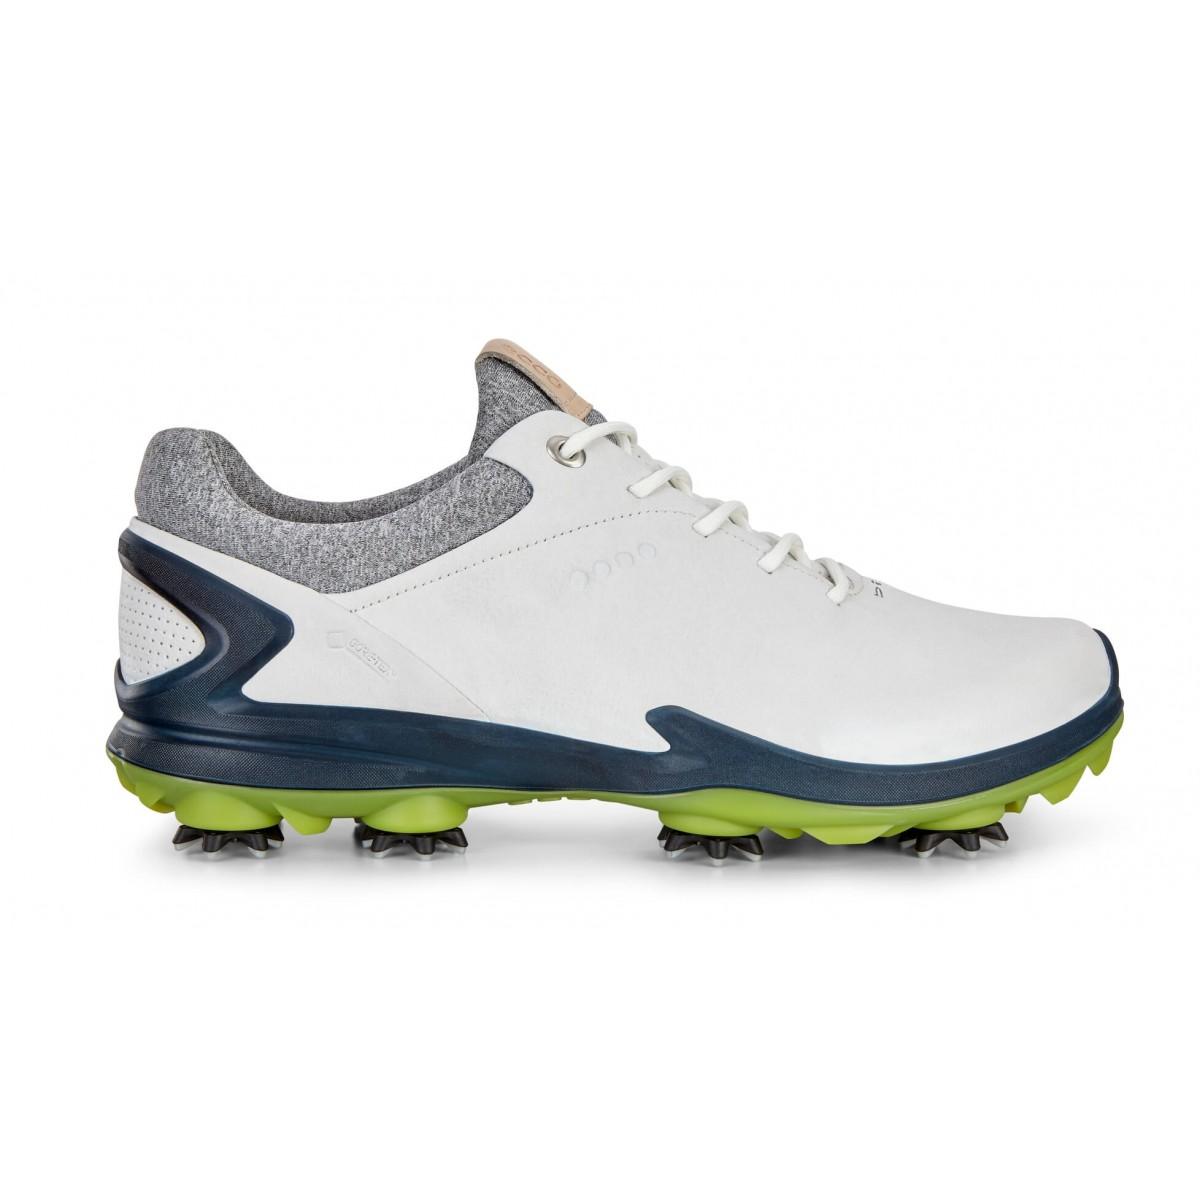 e4f05341b3 ECCO Men's BIOM G3 Gore-Tex GOLF Shoes White